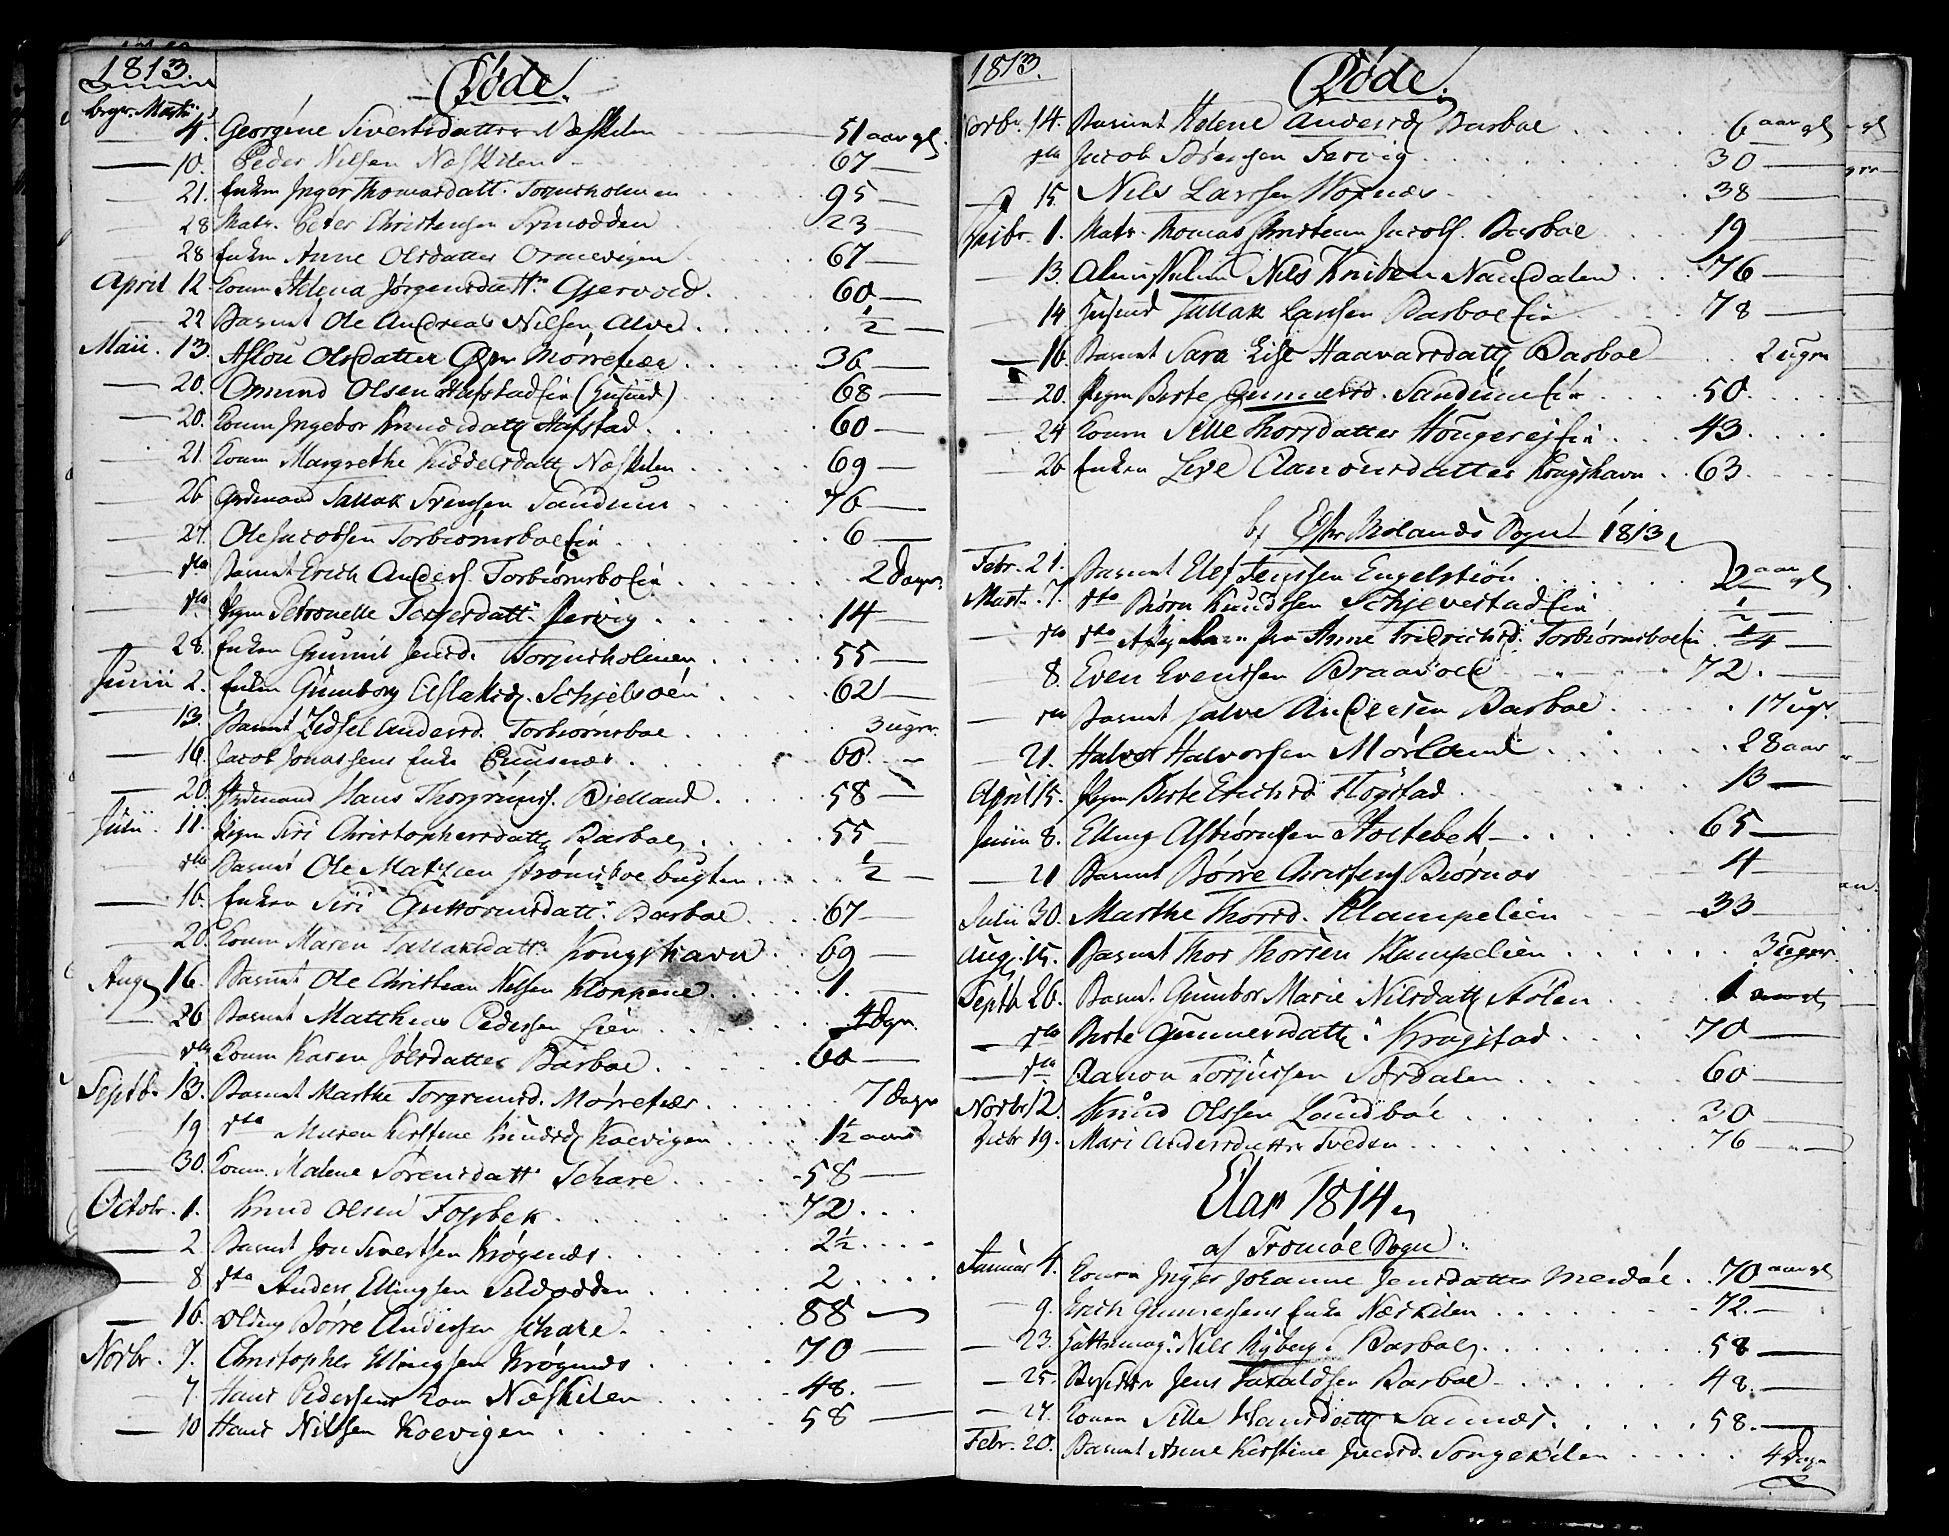 SAK, Austre Moland sokneprestkontor, F/Fa/Faa/L0003: Ministerialbok nr. A 3, 1808-1815, s. 147